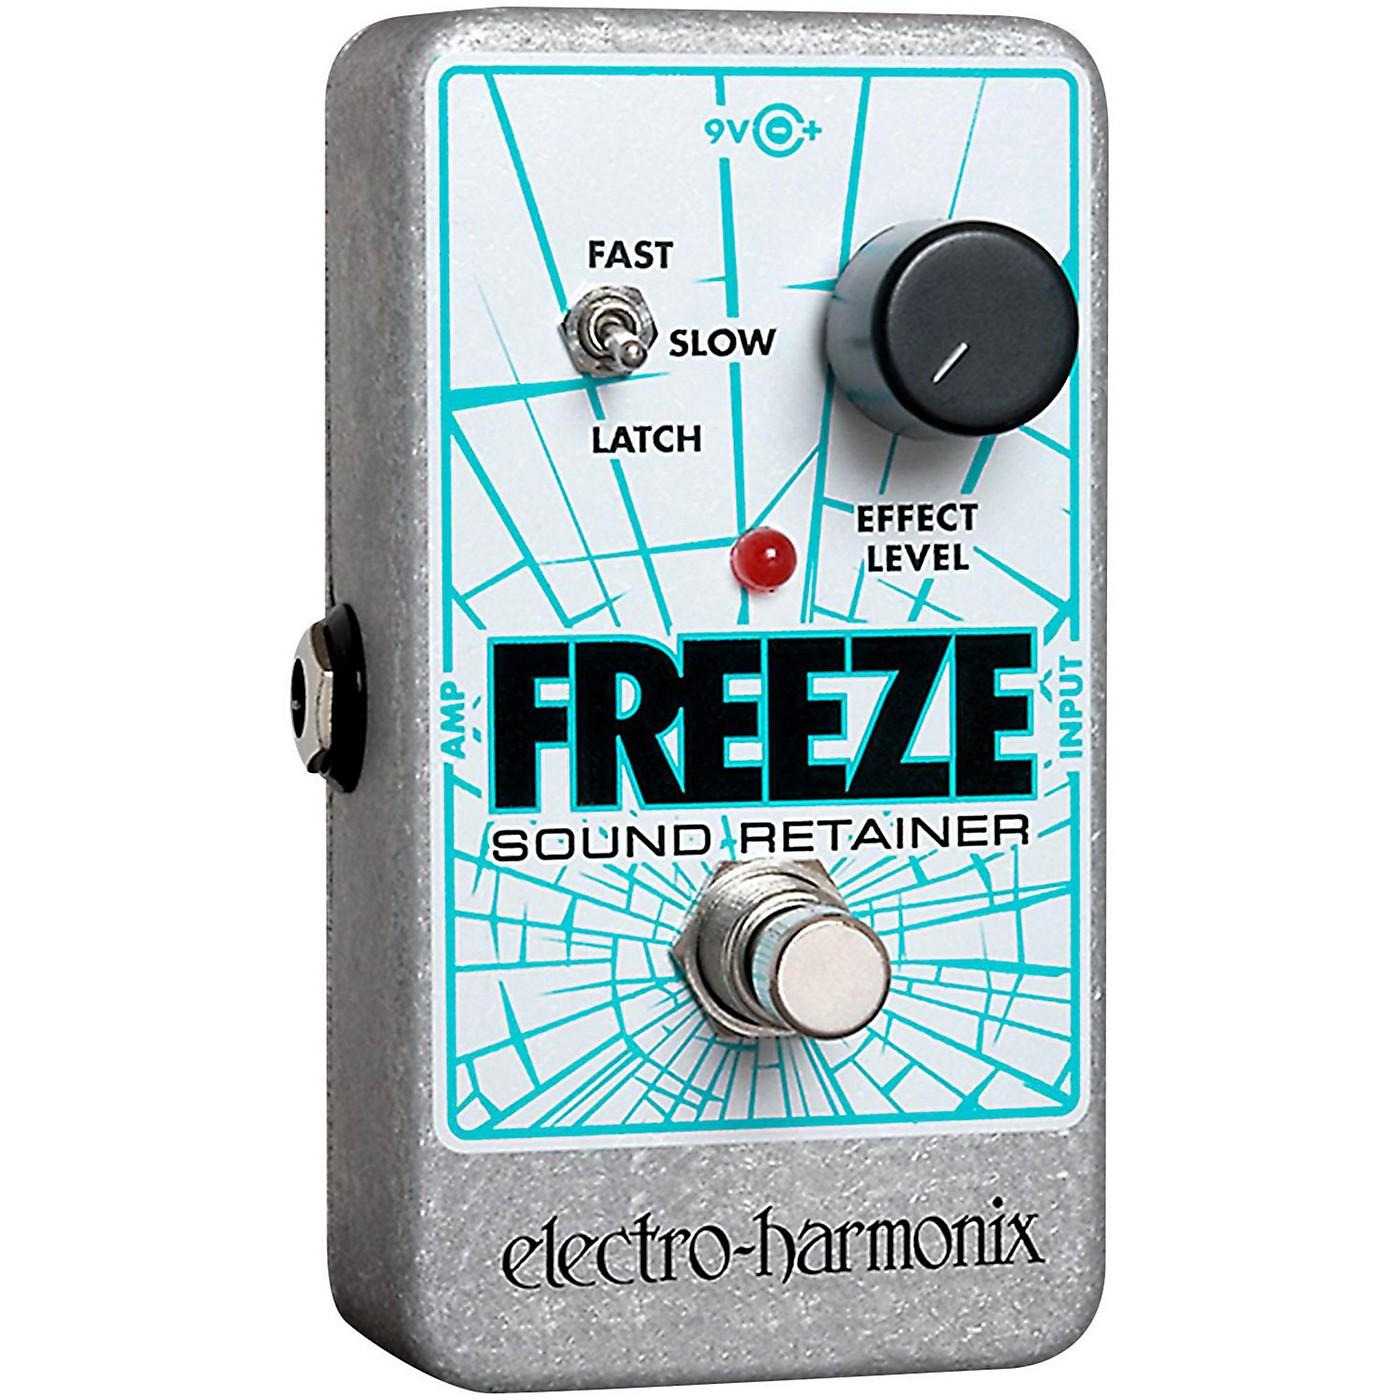 Electro-Harmonix Freeze Sound Retainer Compression Guitar Effects Pedal thumbnail